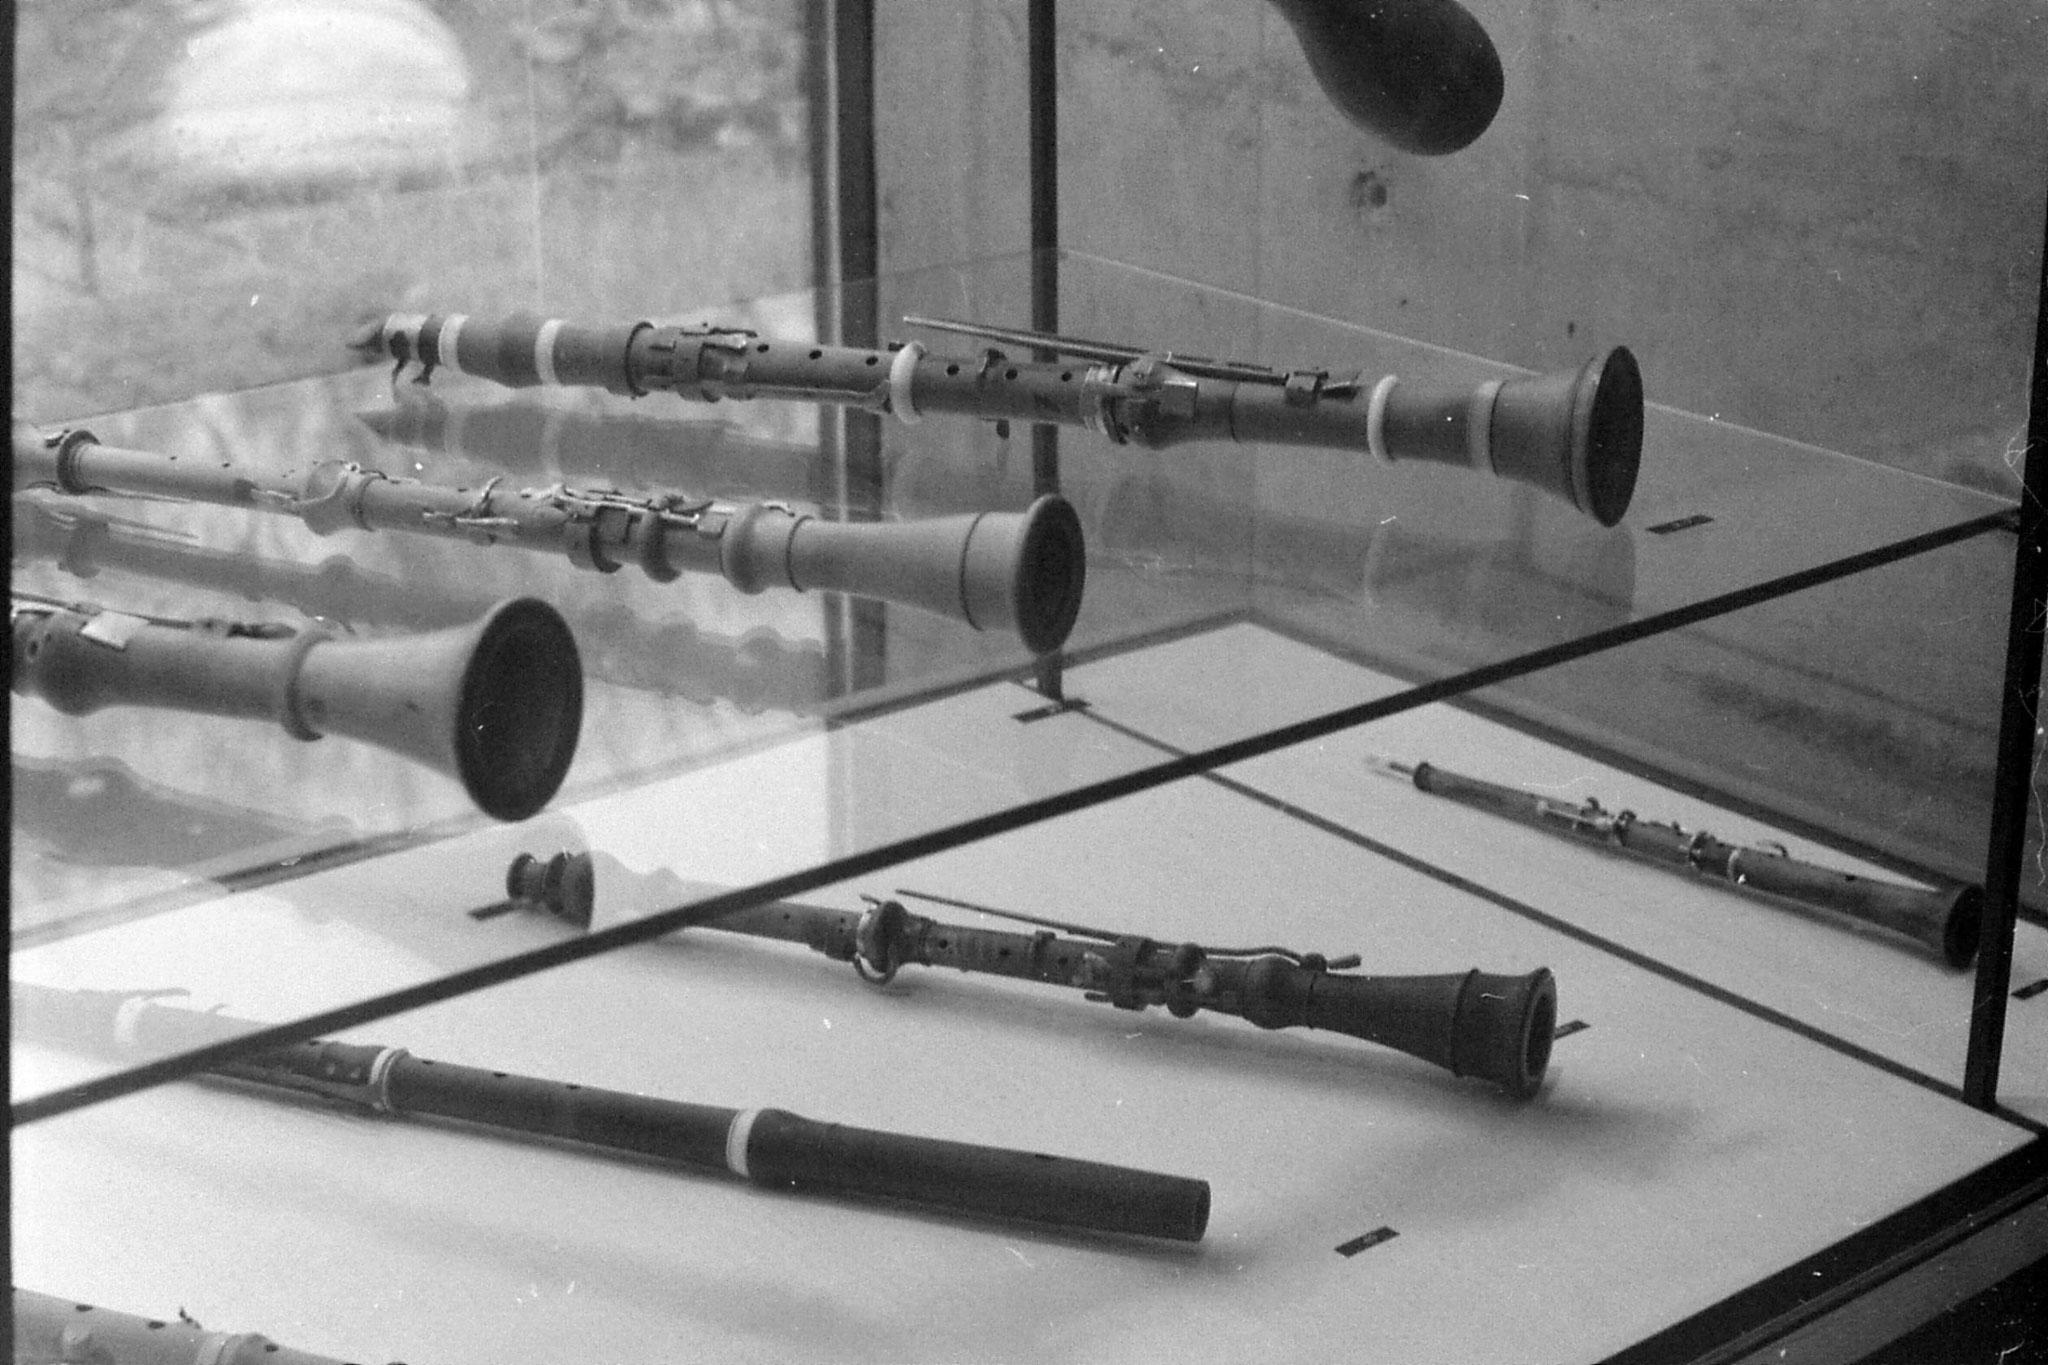 7/10/1988: 32: Sibelius museum, Turku